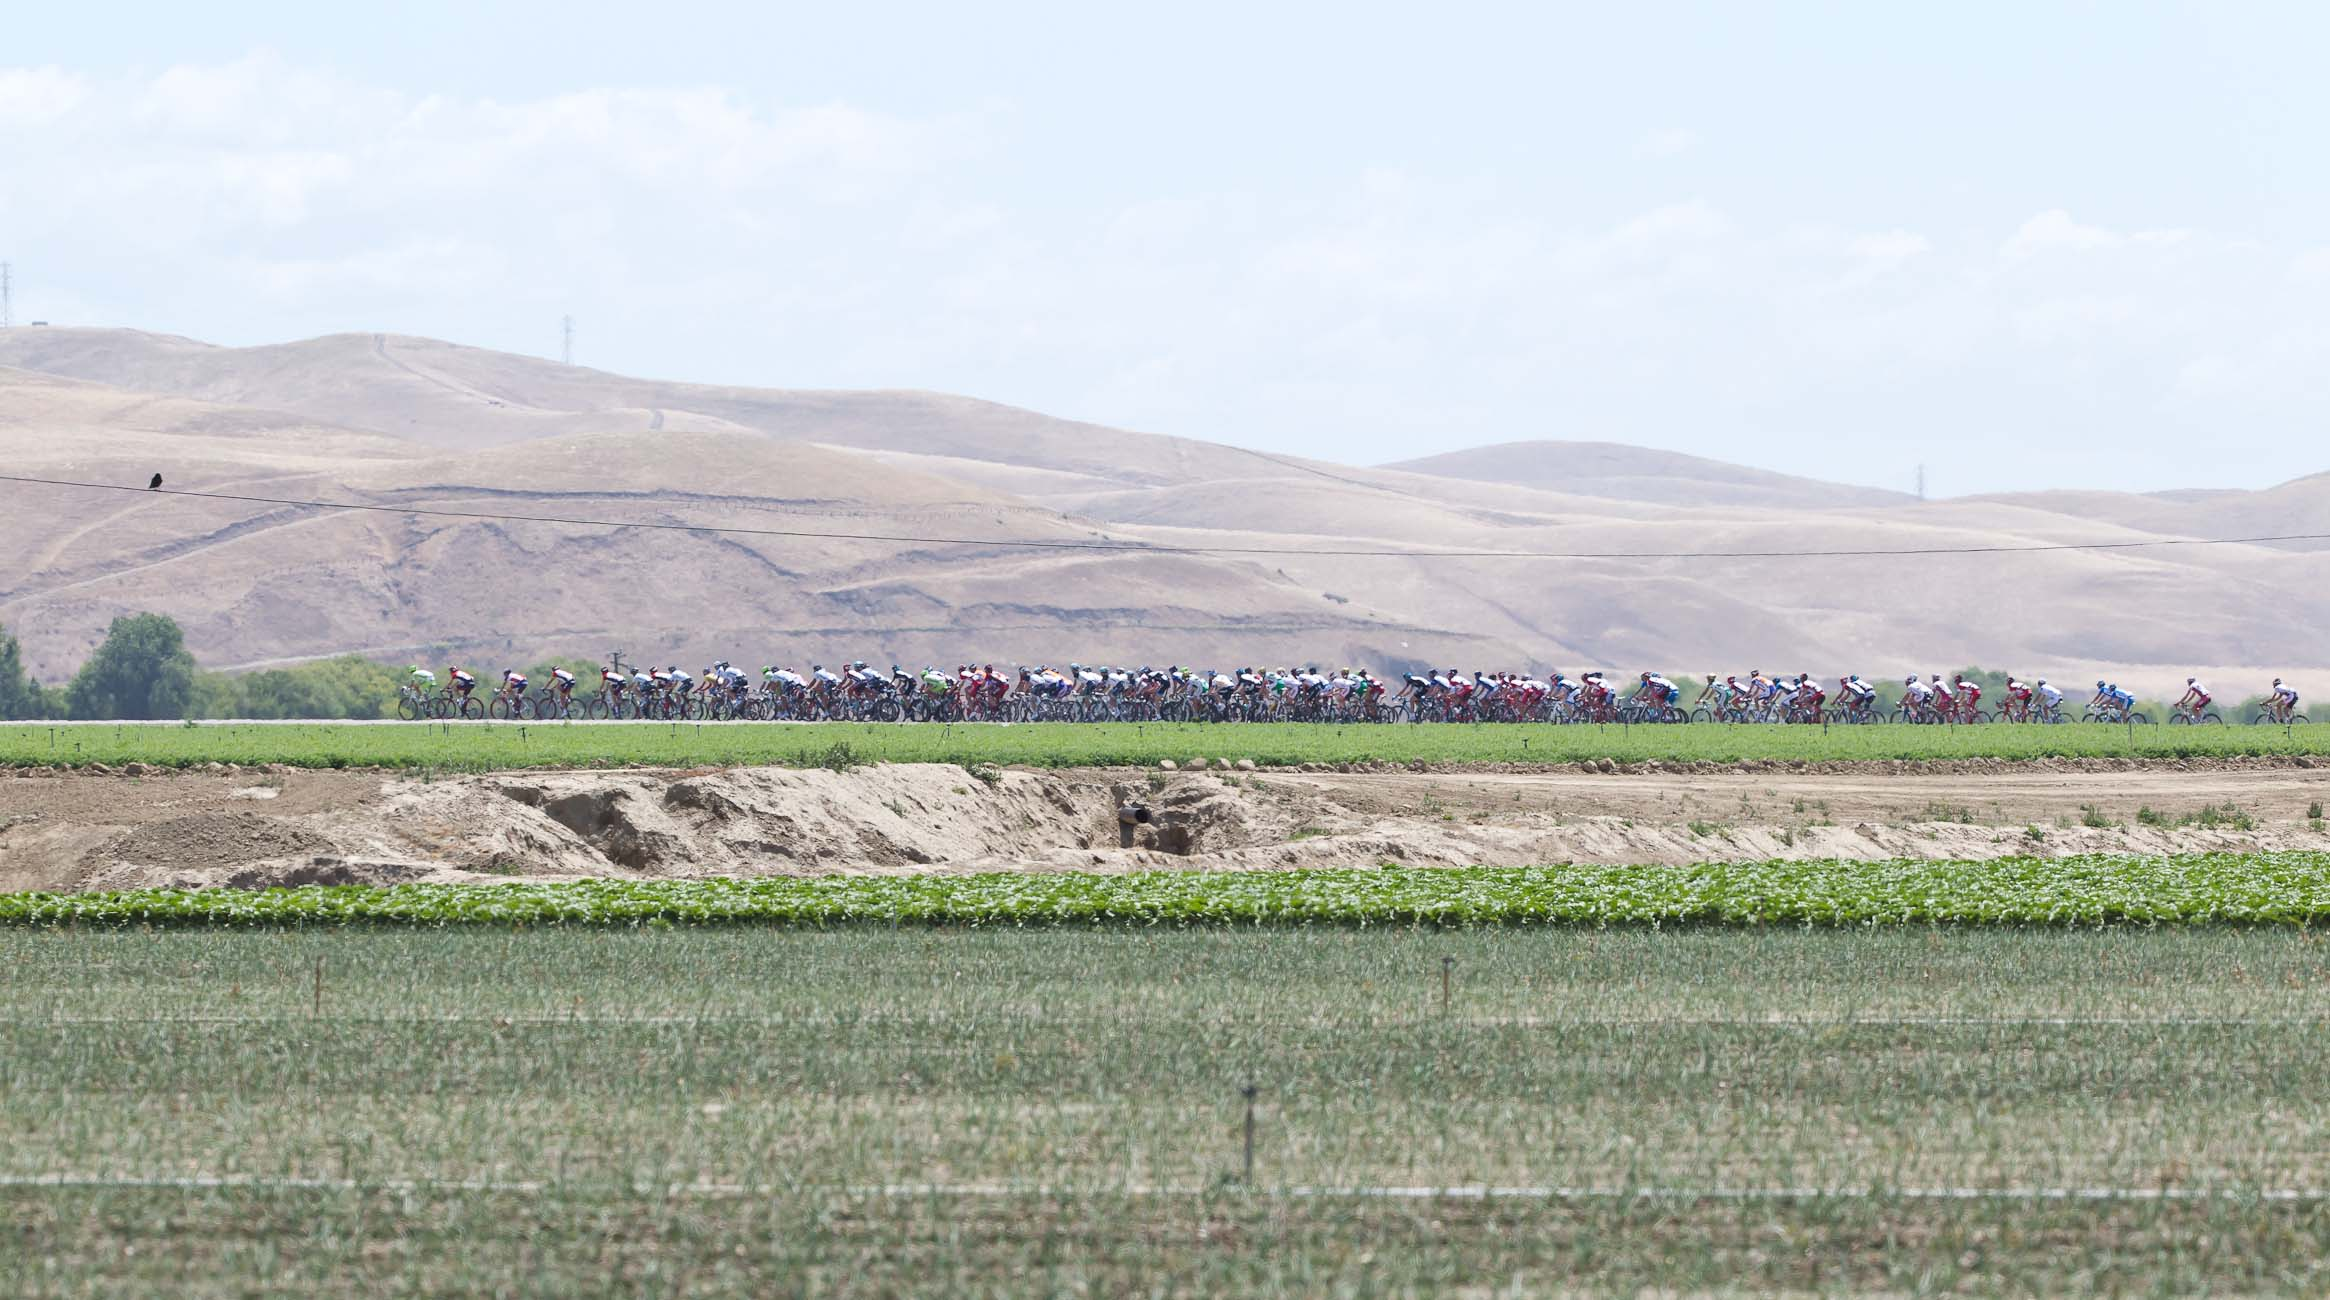 The peloton roars through agricultural california